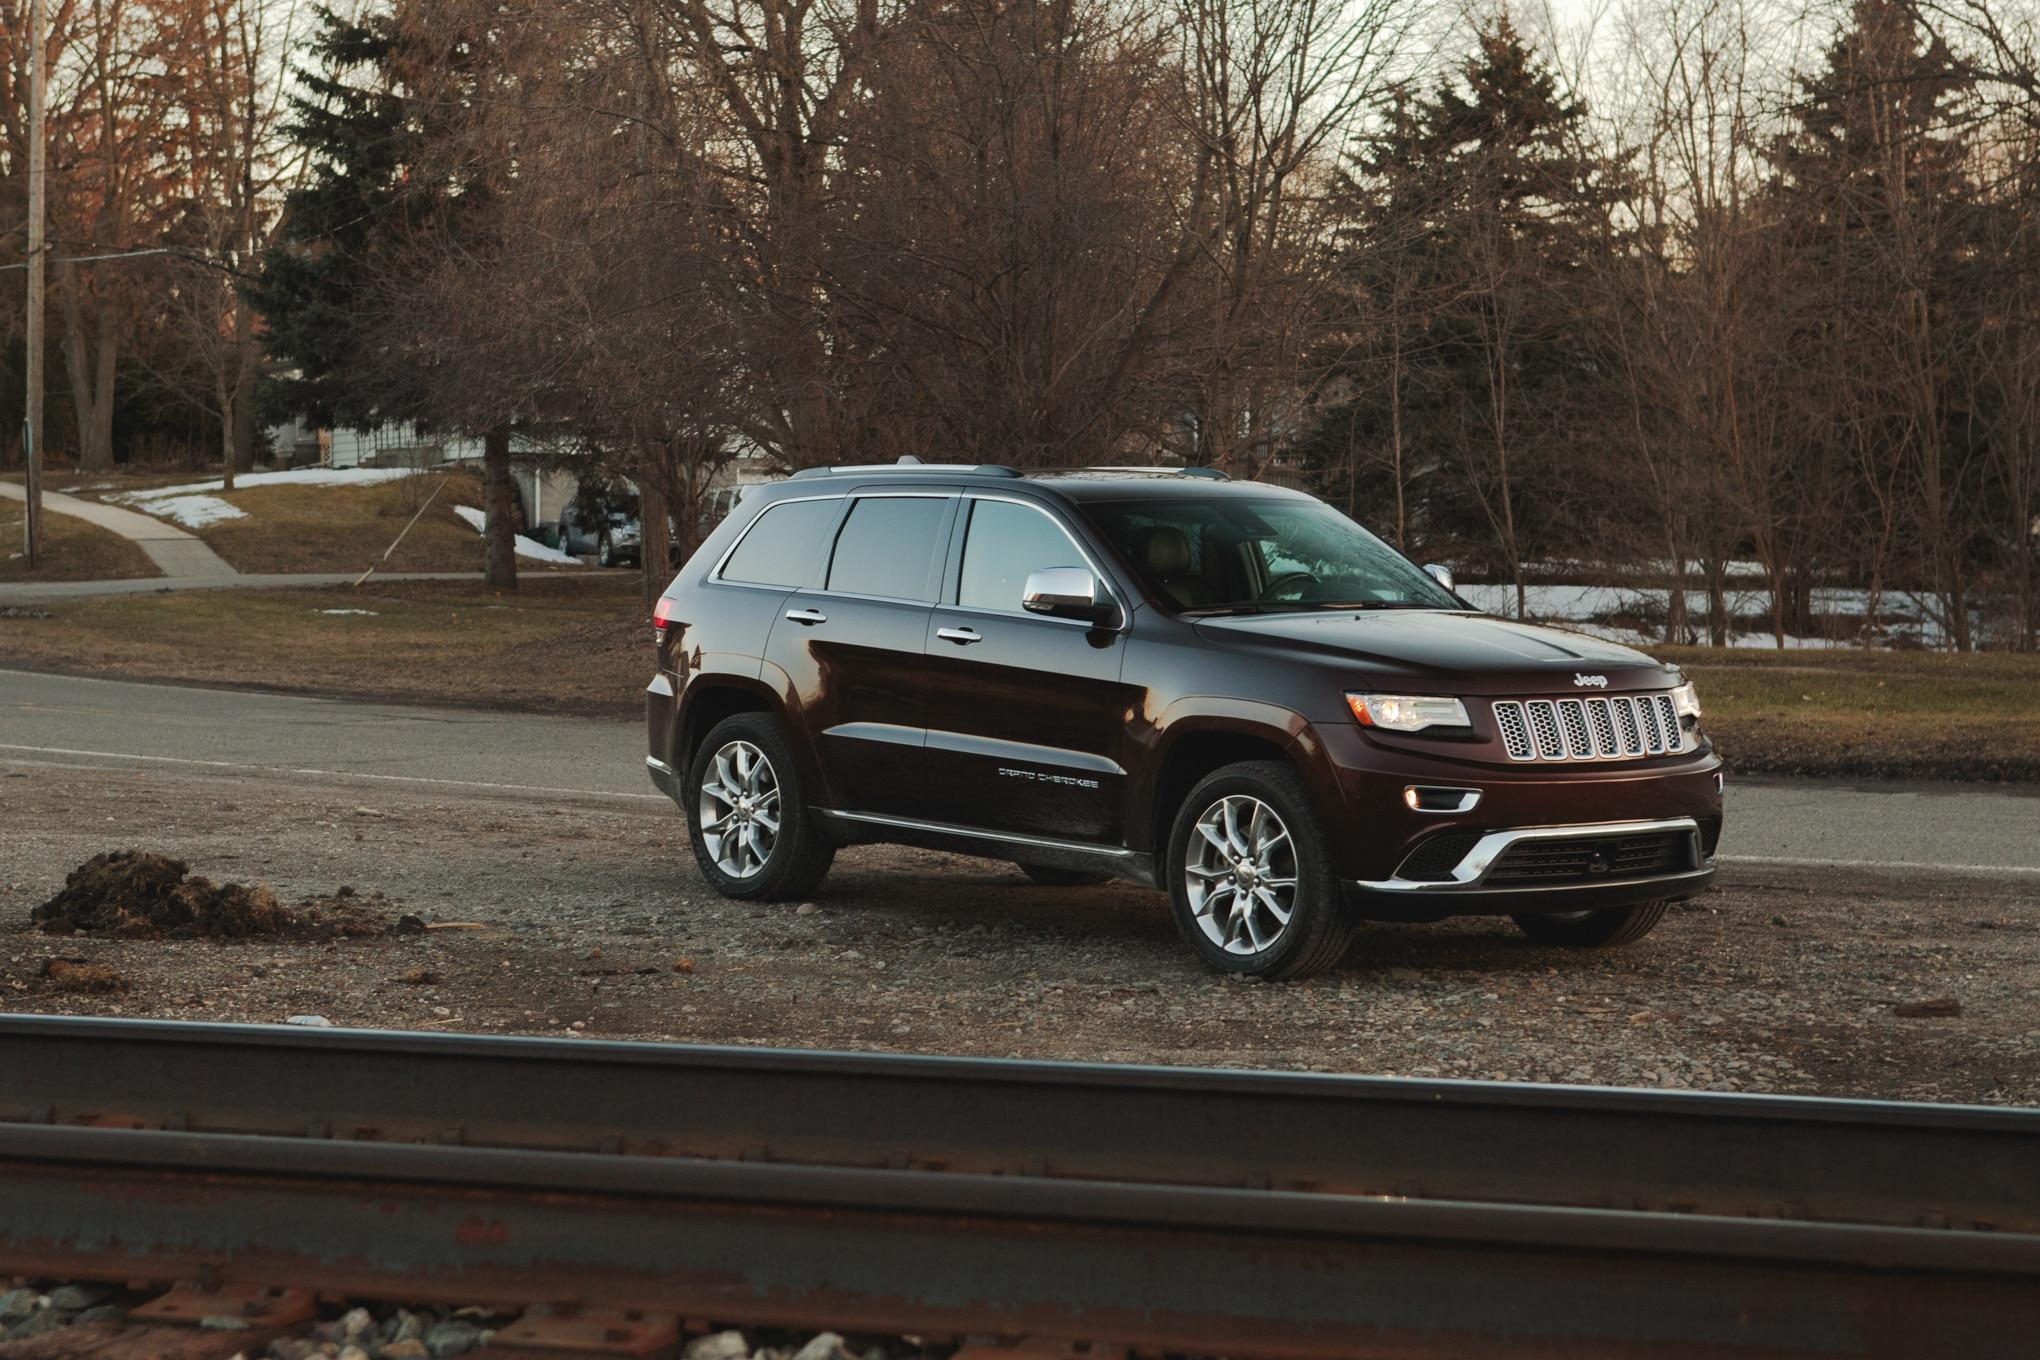 2014 Jeep Grand Cherokee EcoDiesel: Around The Block